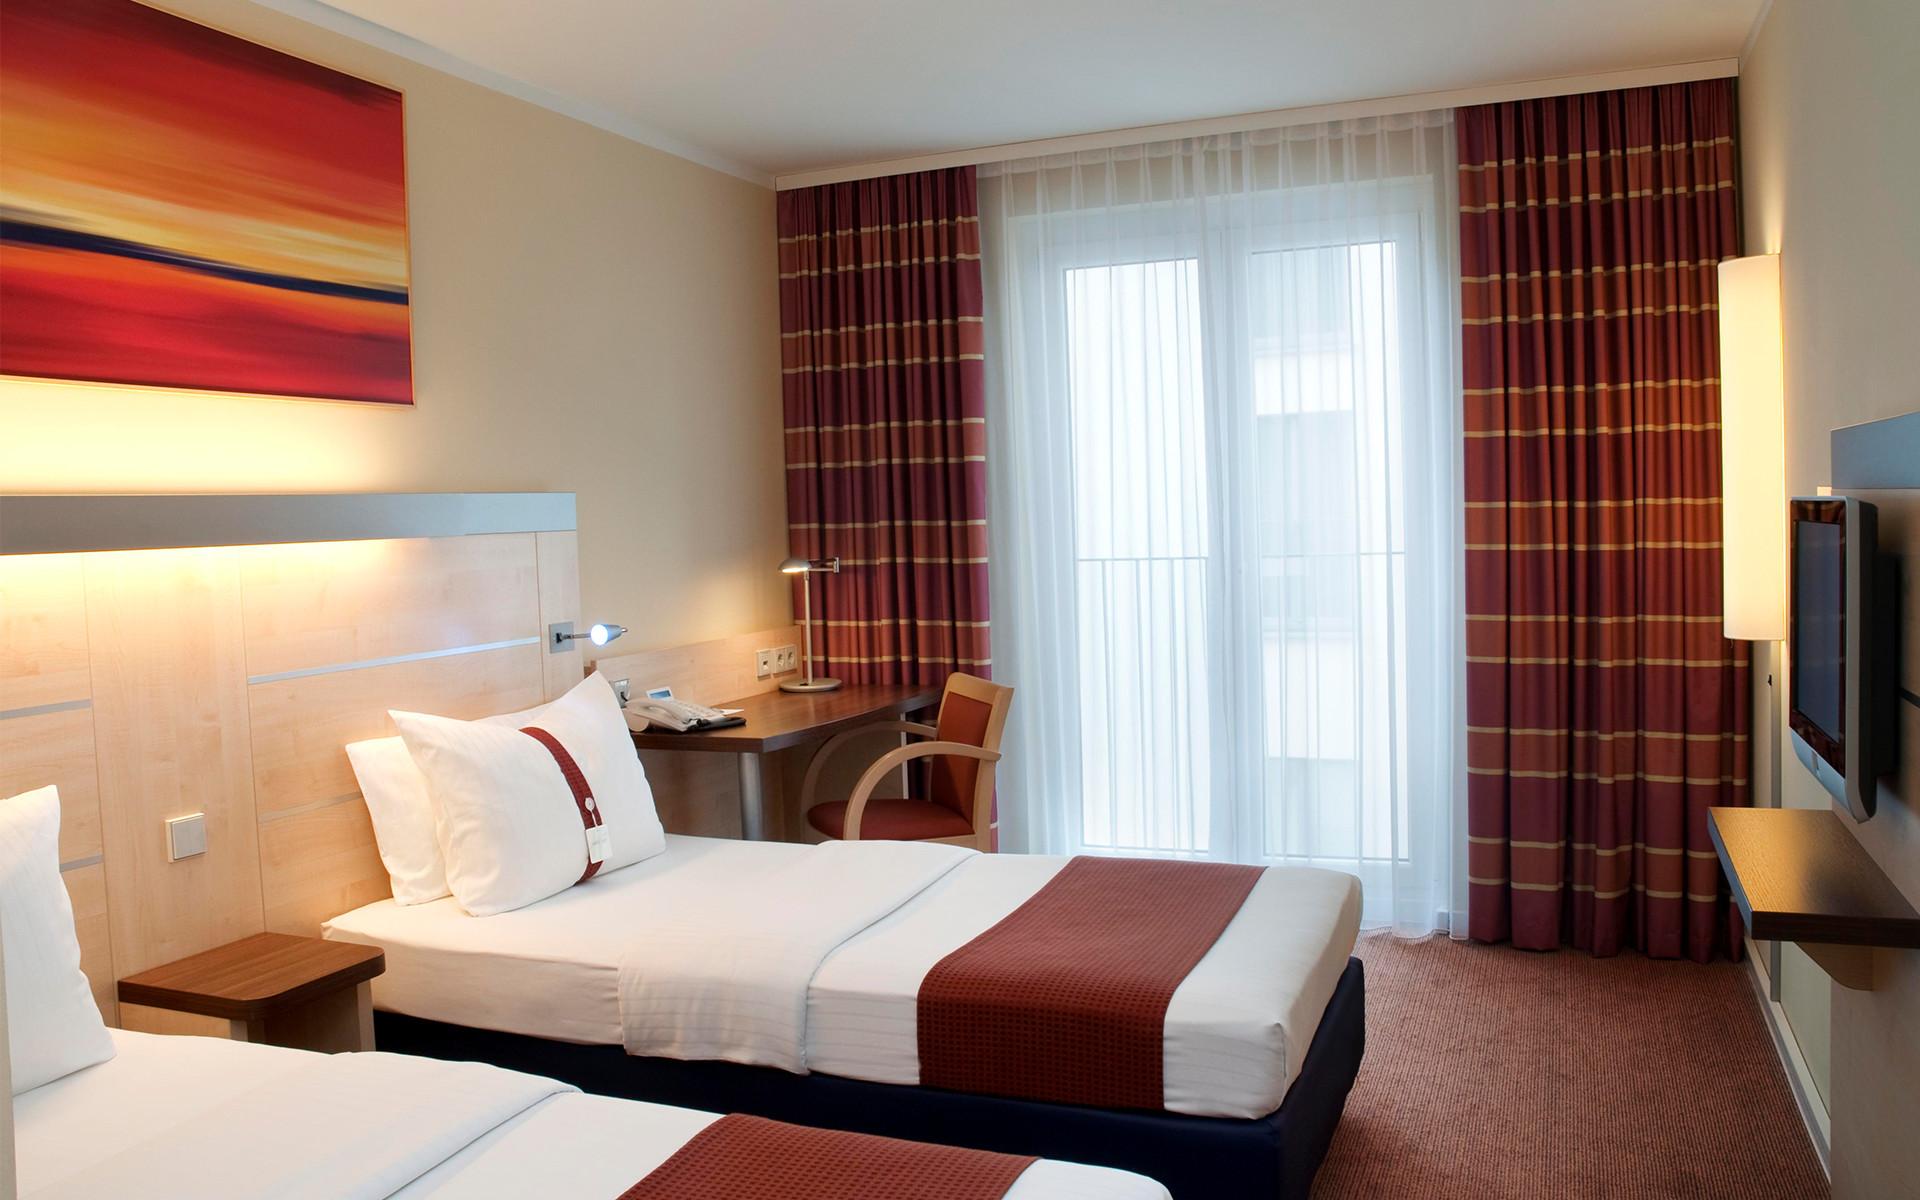 Bad En inn express baden baden success hotel